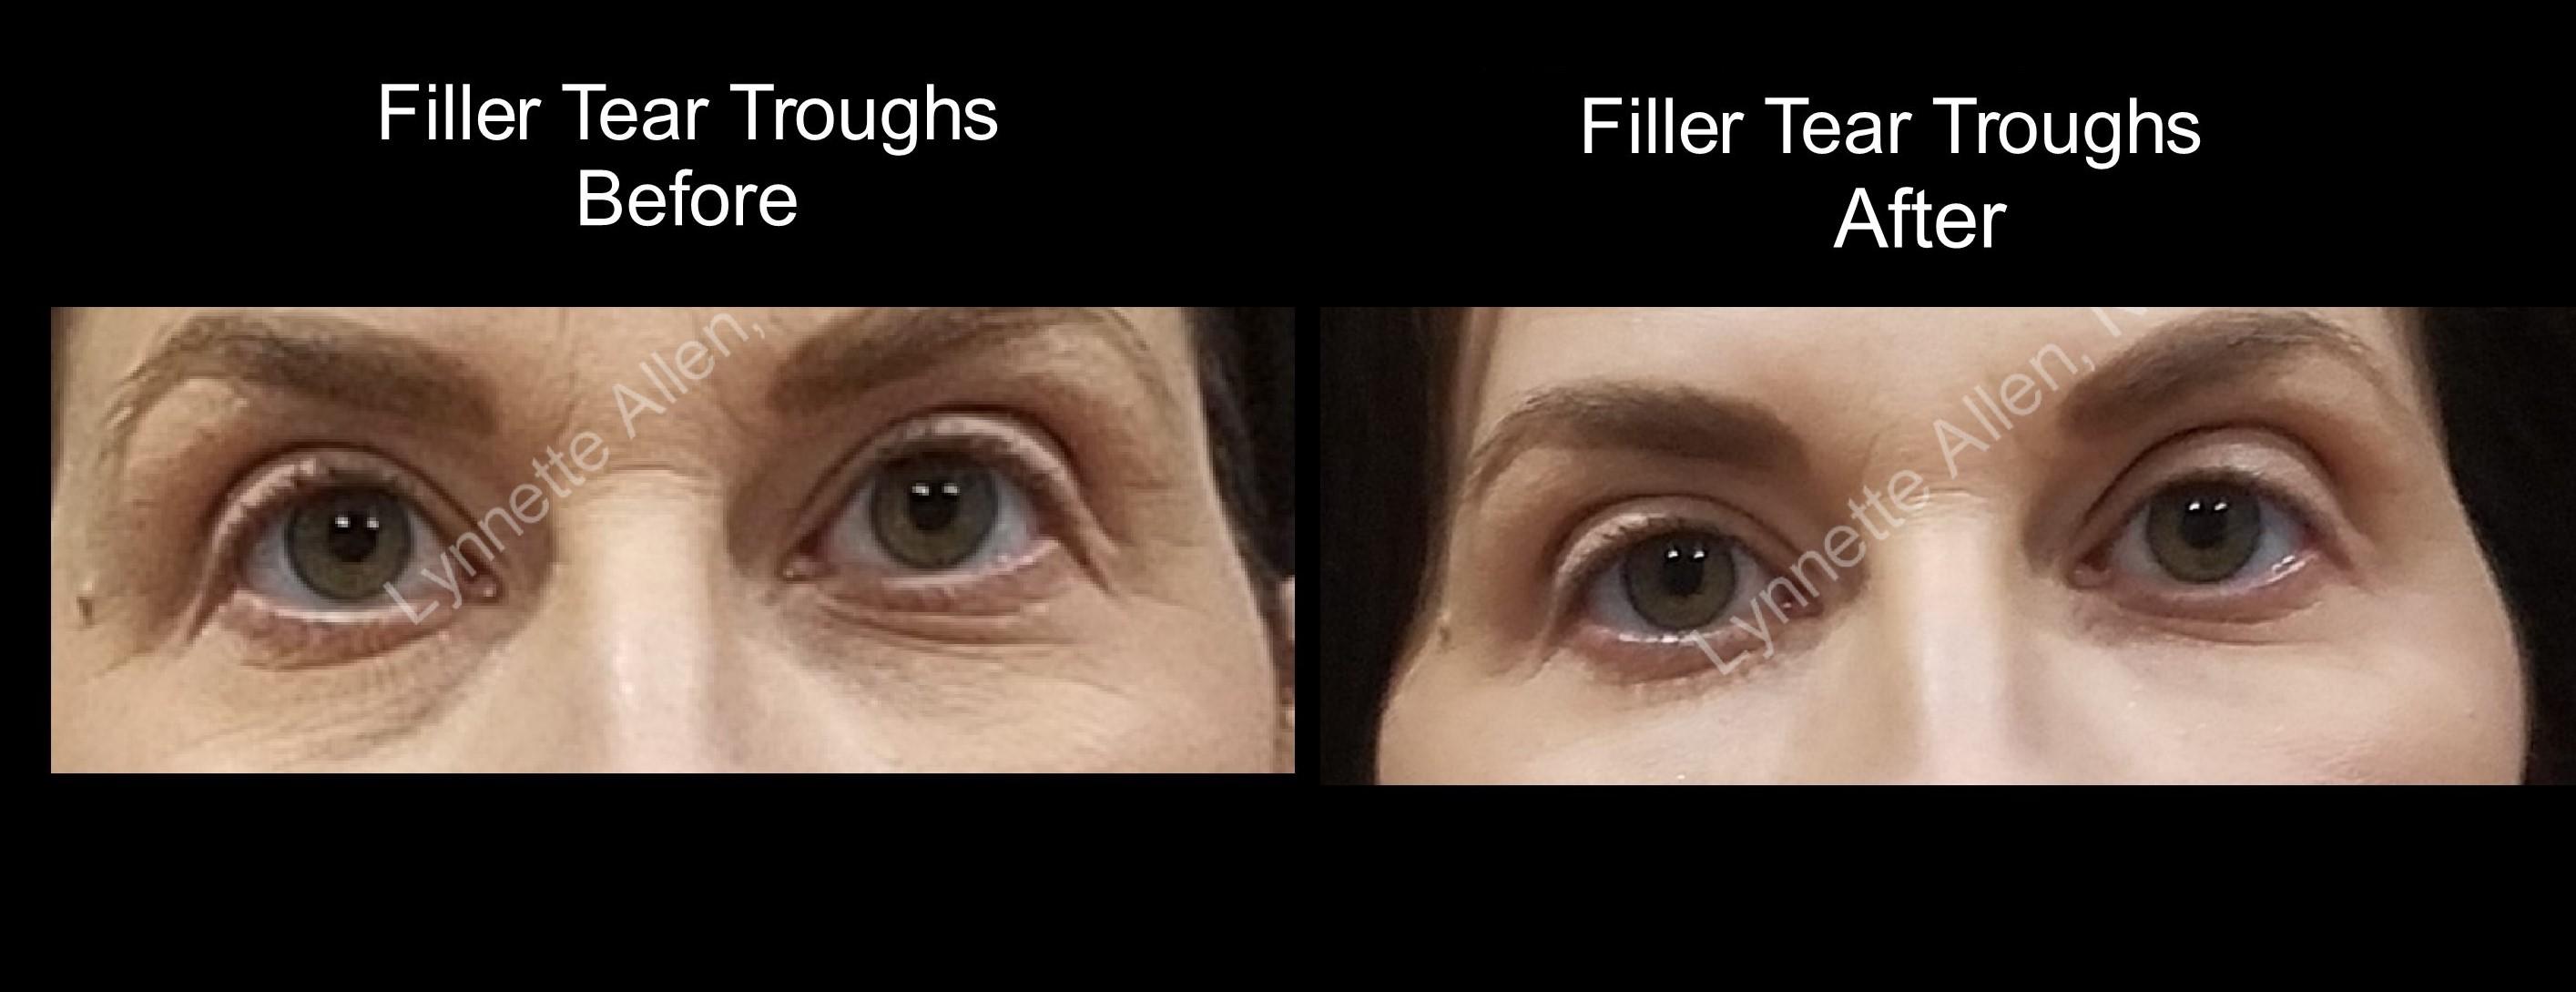 Eye Filler and Botox combo